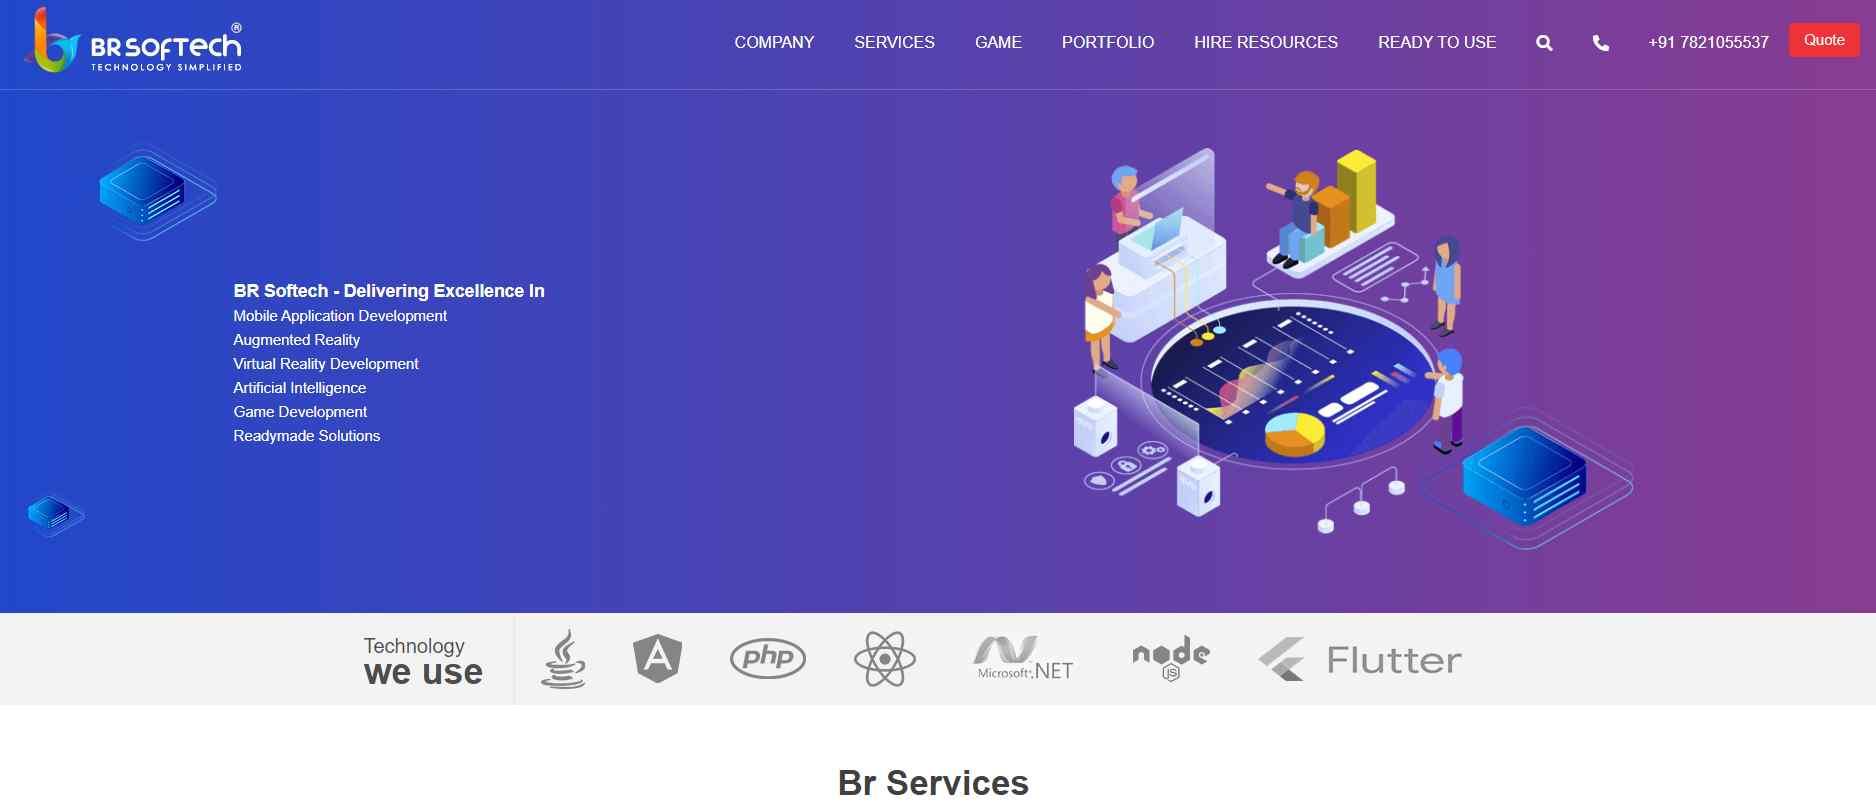 br softech Top Digital Design Agencies in Singapore